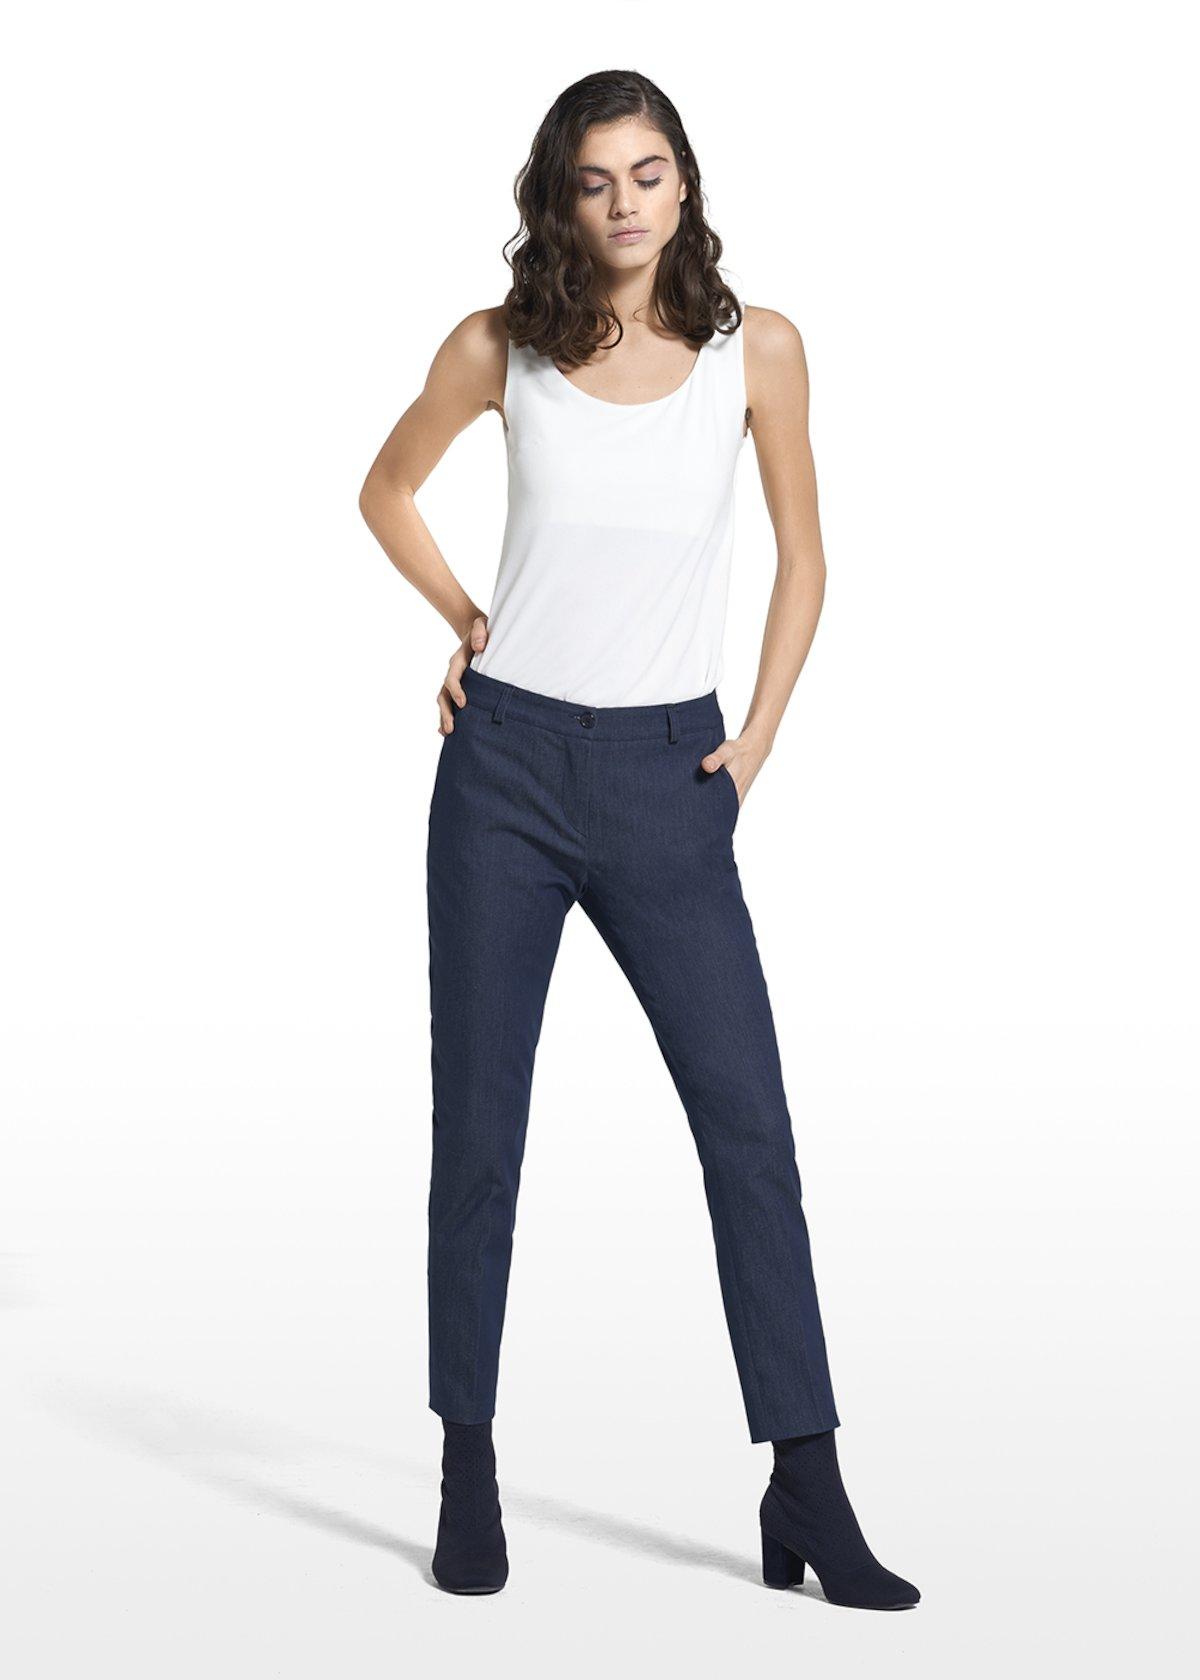 Pantaloni Patrik con imputura esterna - Dark Denim - Donna - Immagine categoria